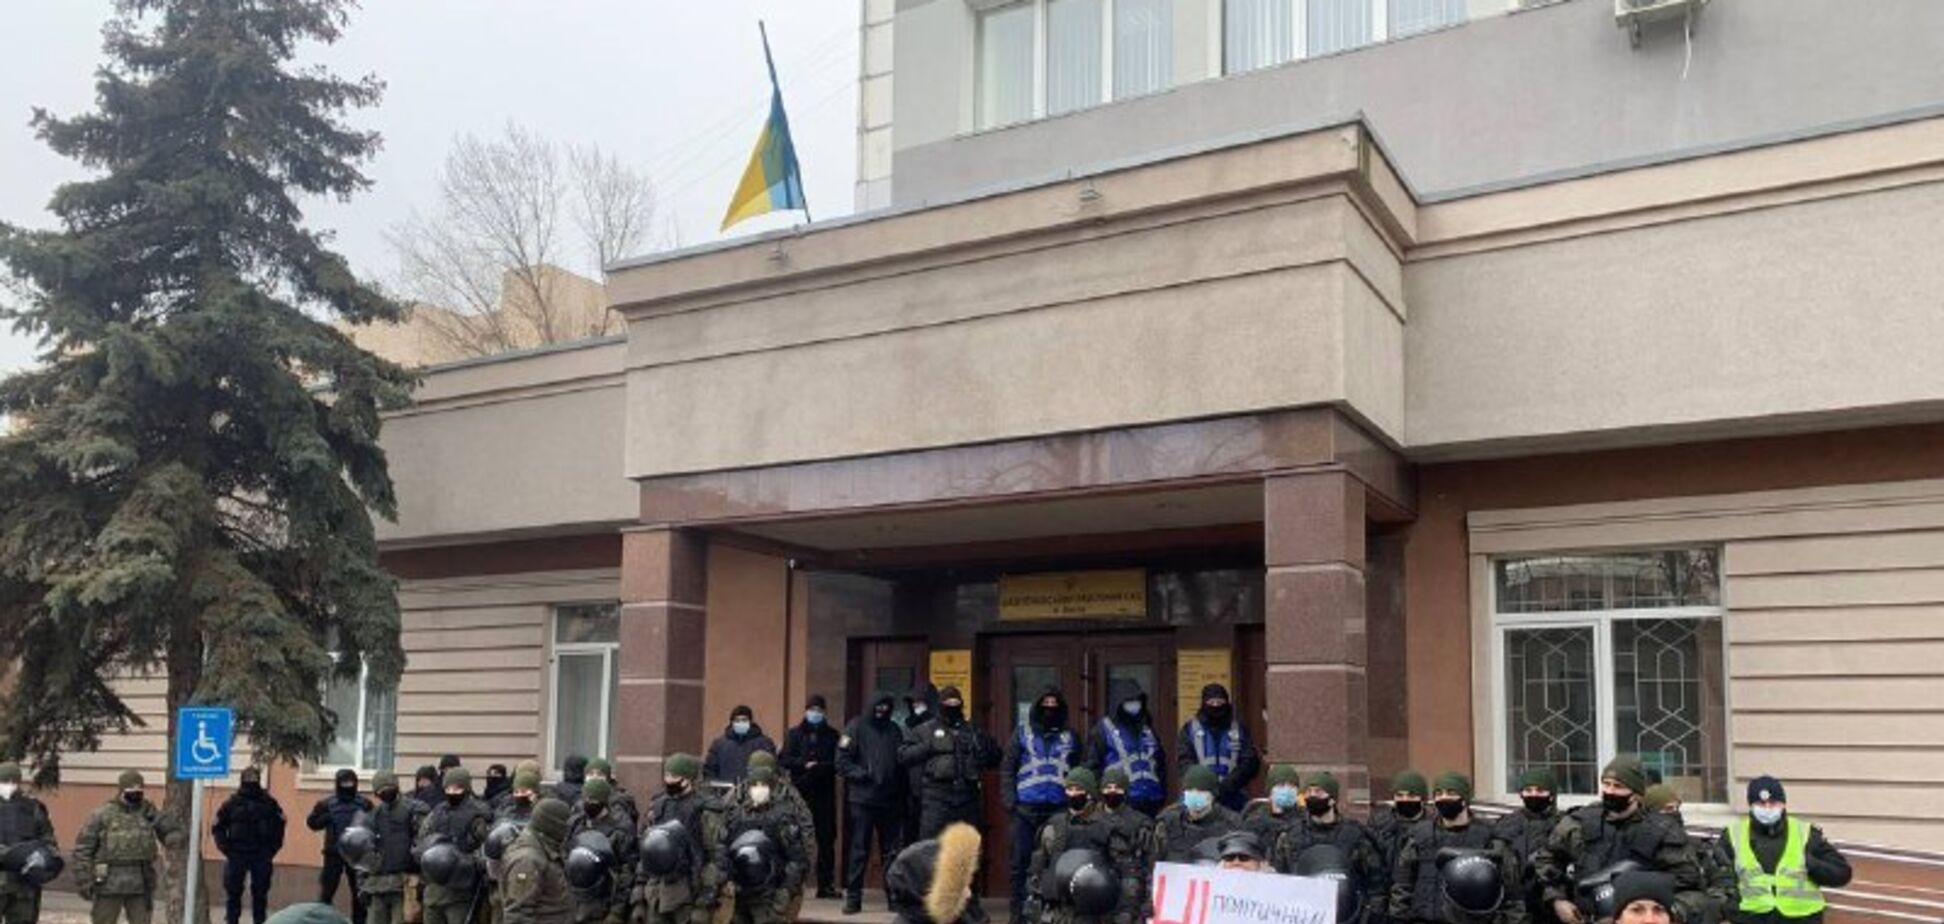 В Киеве произошли стычки полиции с протестующими из-за суда по делу Шеремета